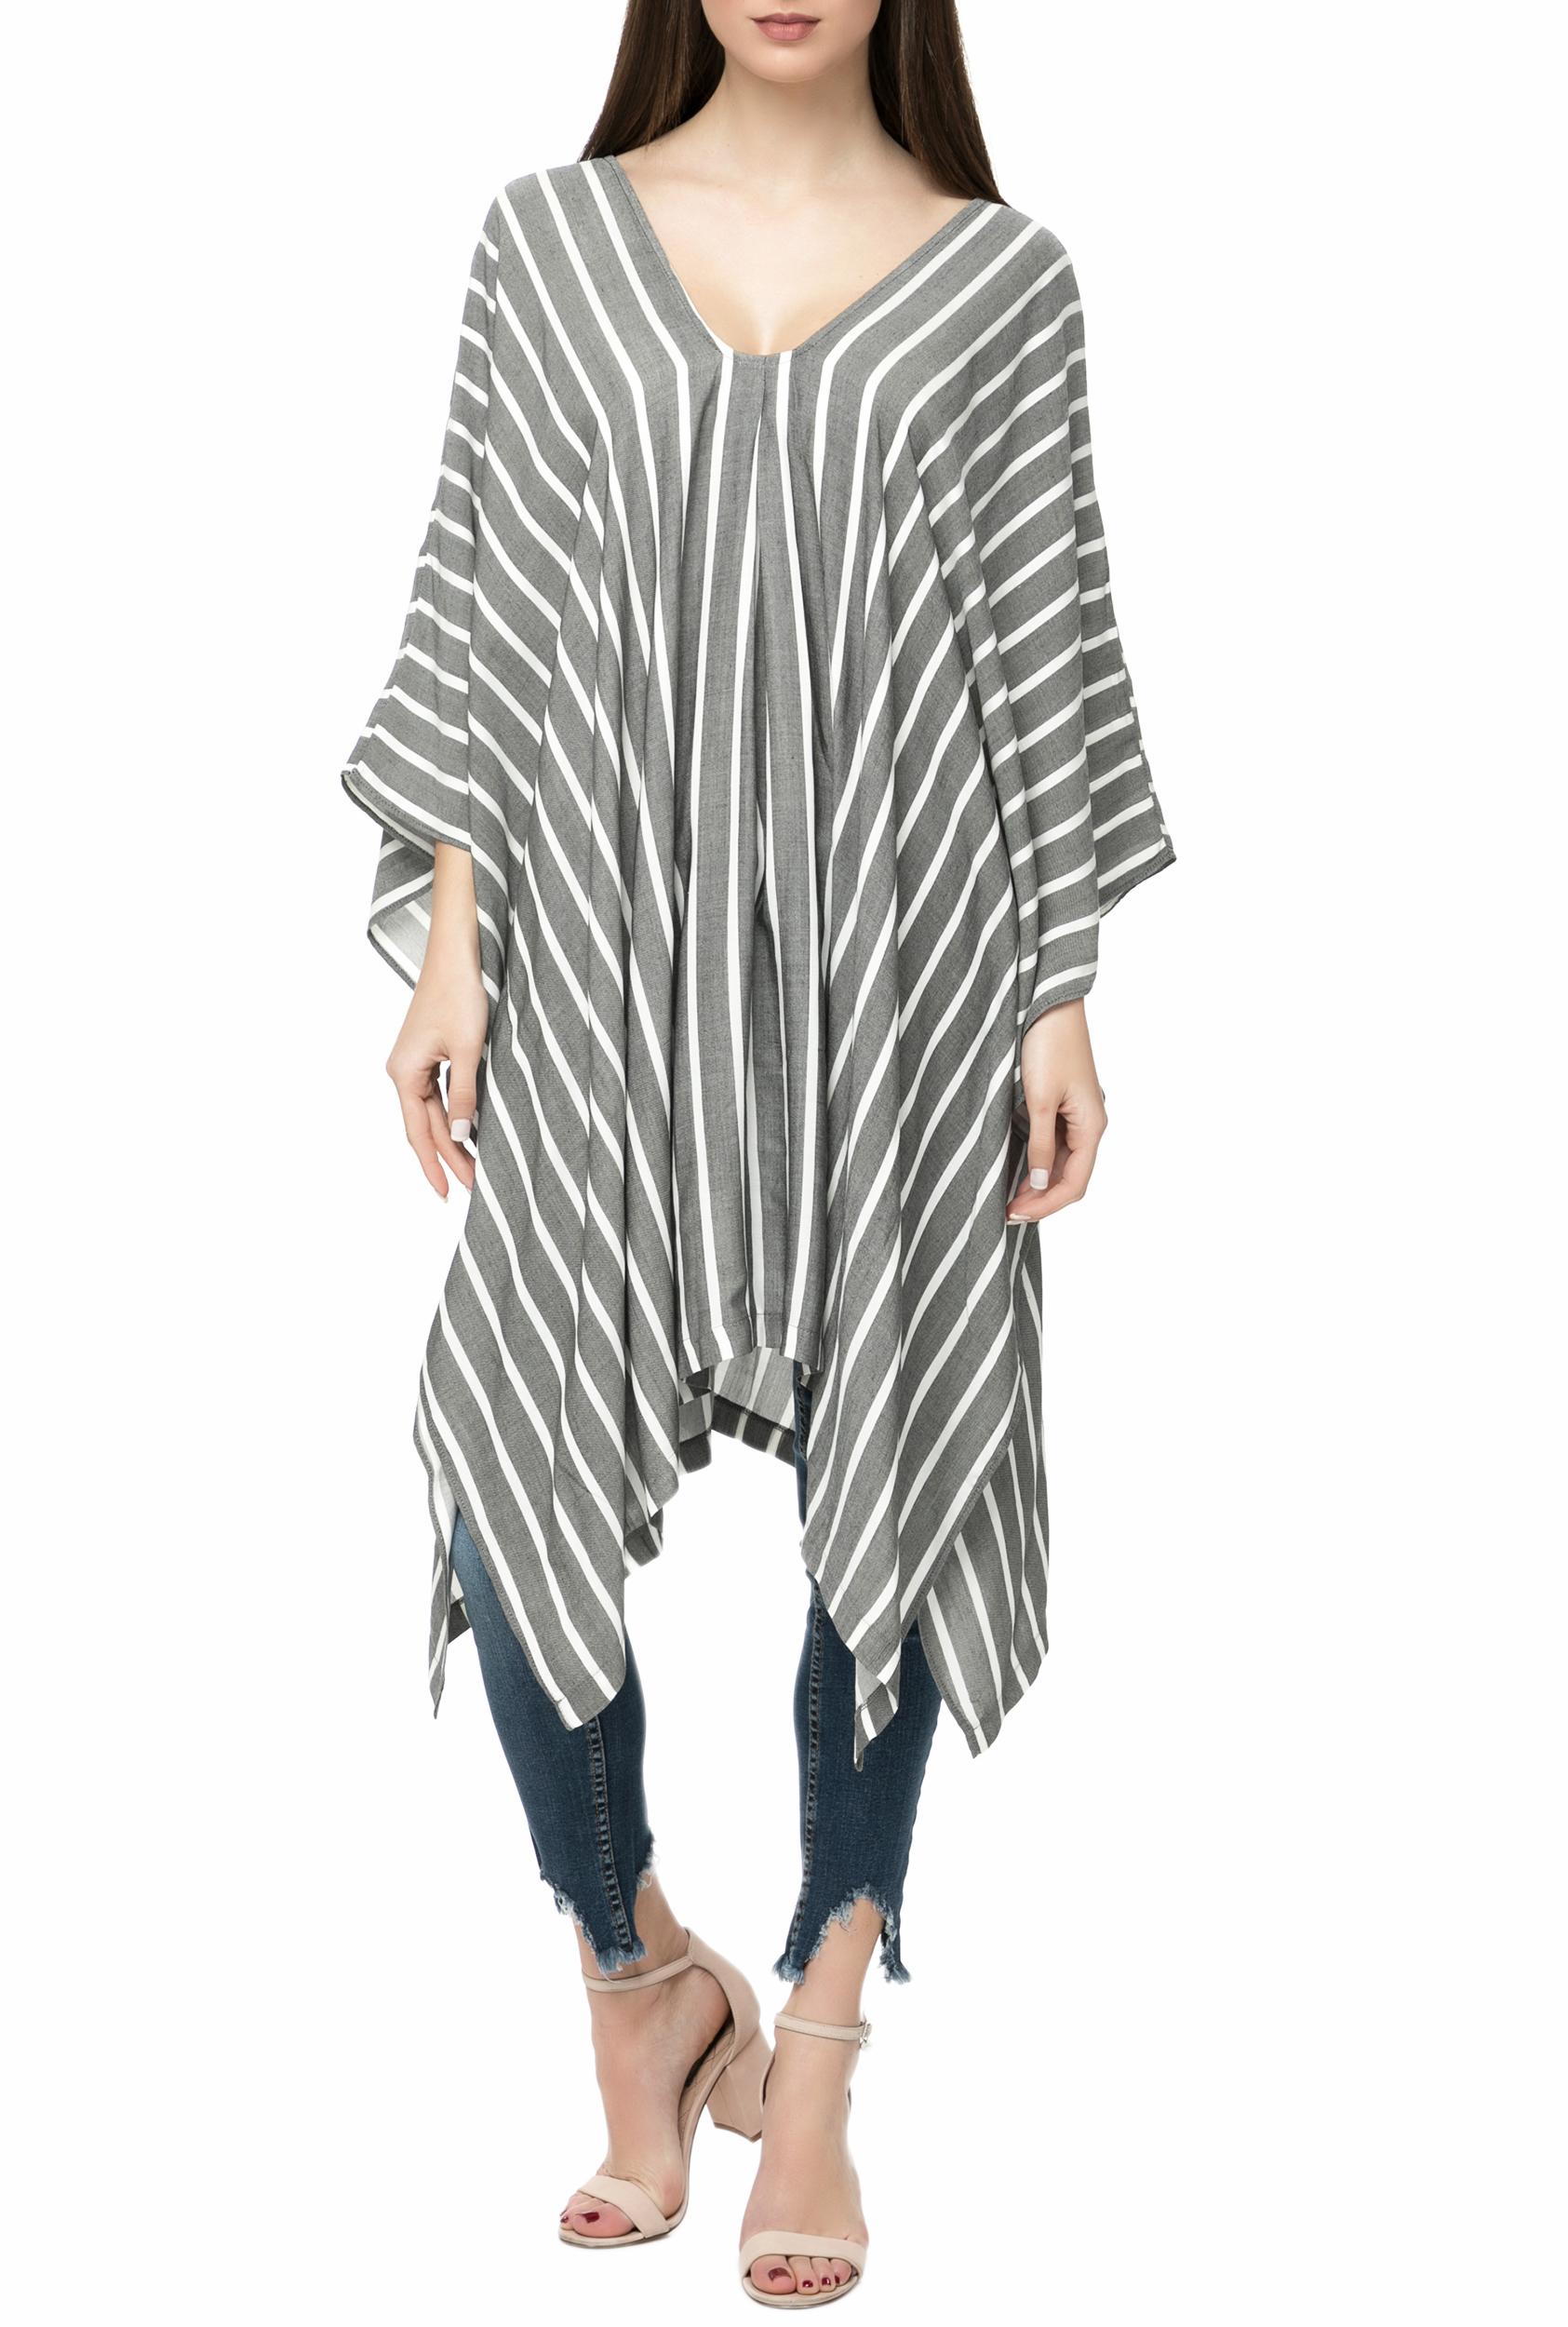 LA DOLLS - Γυναικεία μακριά ριγέ τουνίκ L.A. DOLLS MORNING STRIPED γκρι-λευκή γυναικεία ρούχα πουκάμισα πουκαμίσες